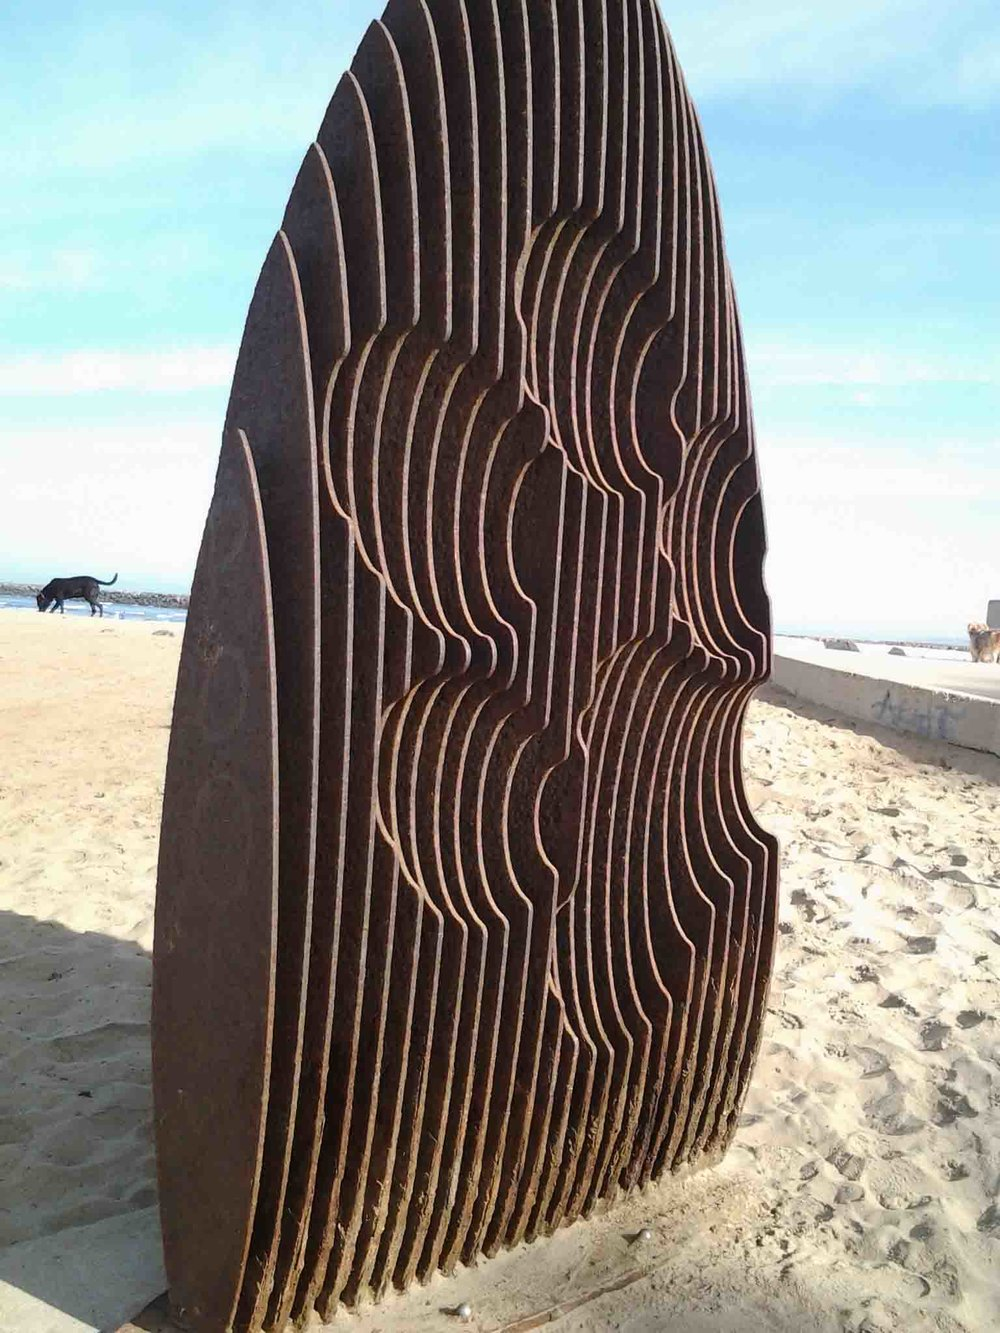 Dog Beach surfboard/pawprint sculpture                 Photo: (c) Barb Ayers, DogDiary.org